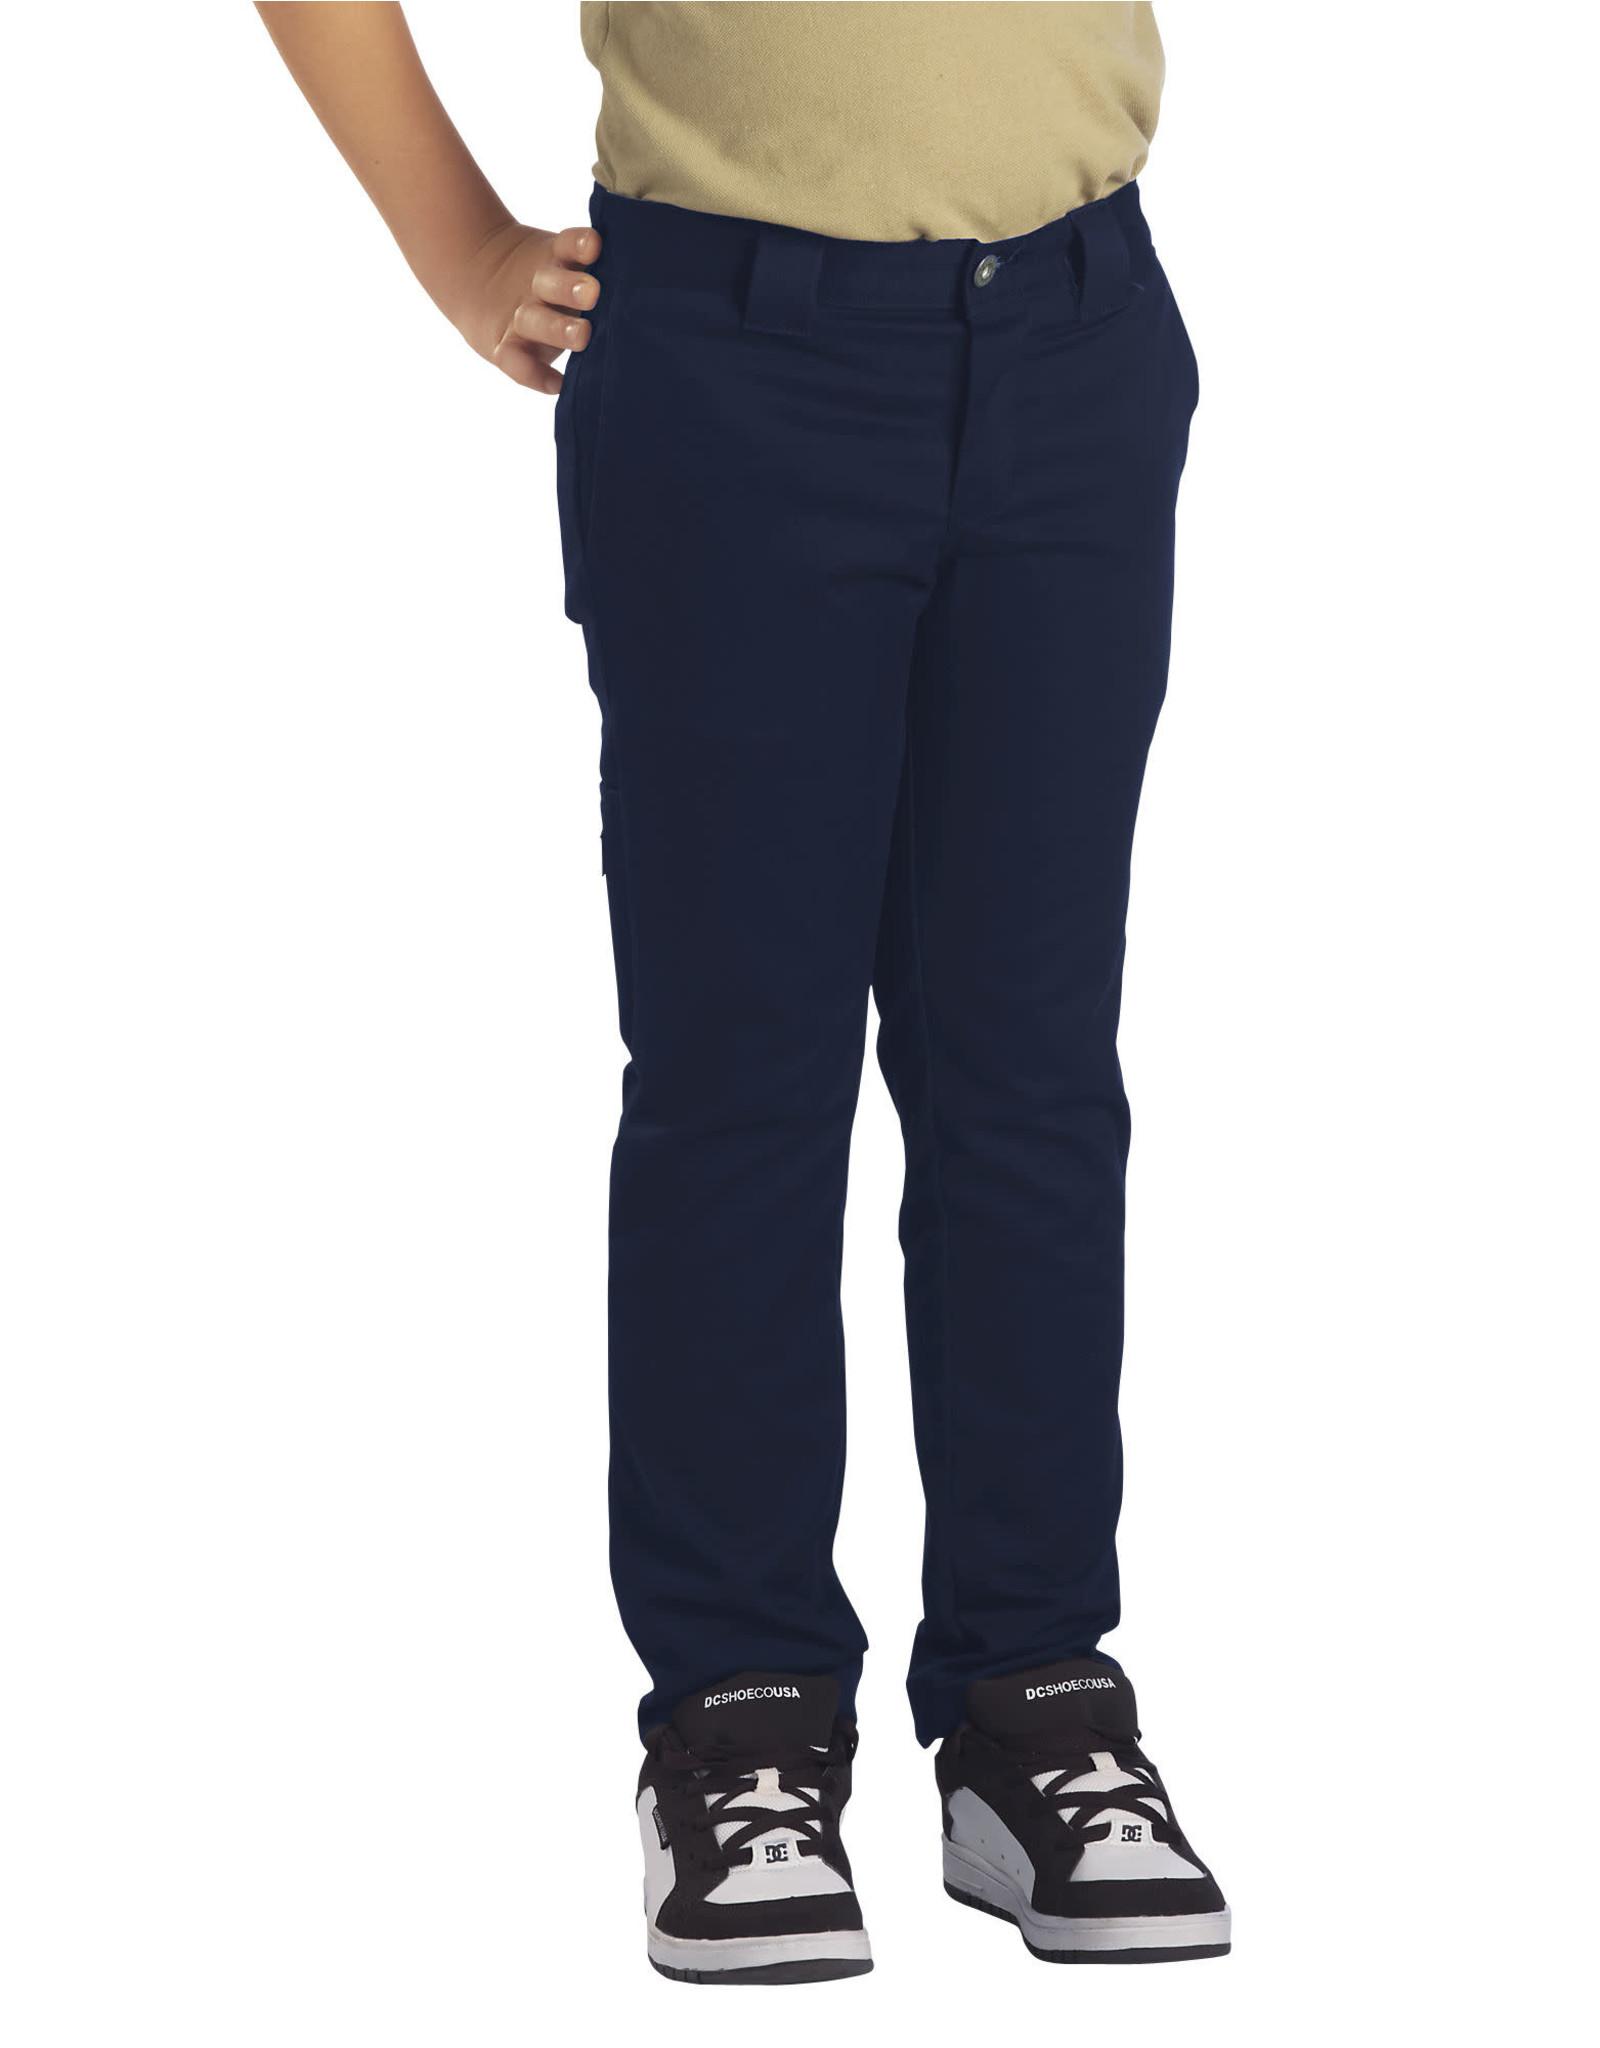 DICKIES Boys' Flex Skinny Fit Straight Leg Pants QP801